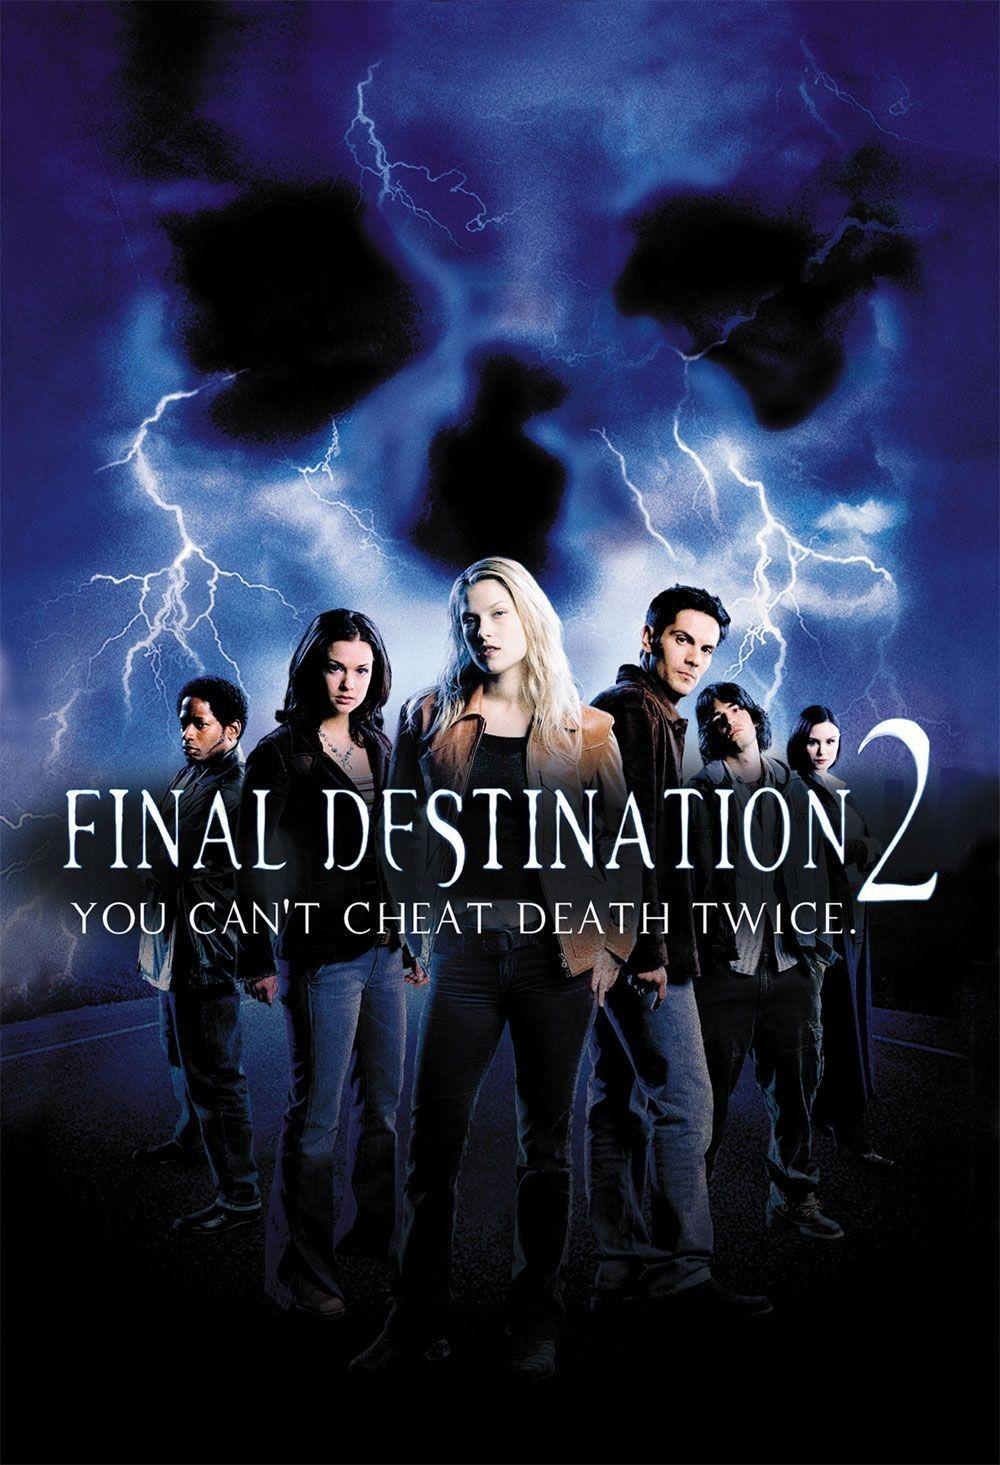 Destino Final 2 2003 Destino Final 2 Peliculas Clasicas De Terror Peliculas De Terror